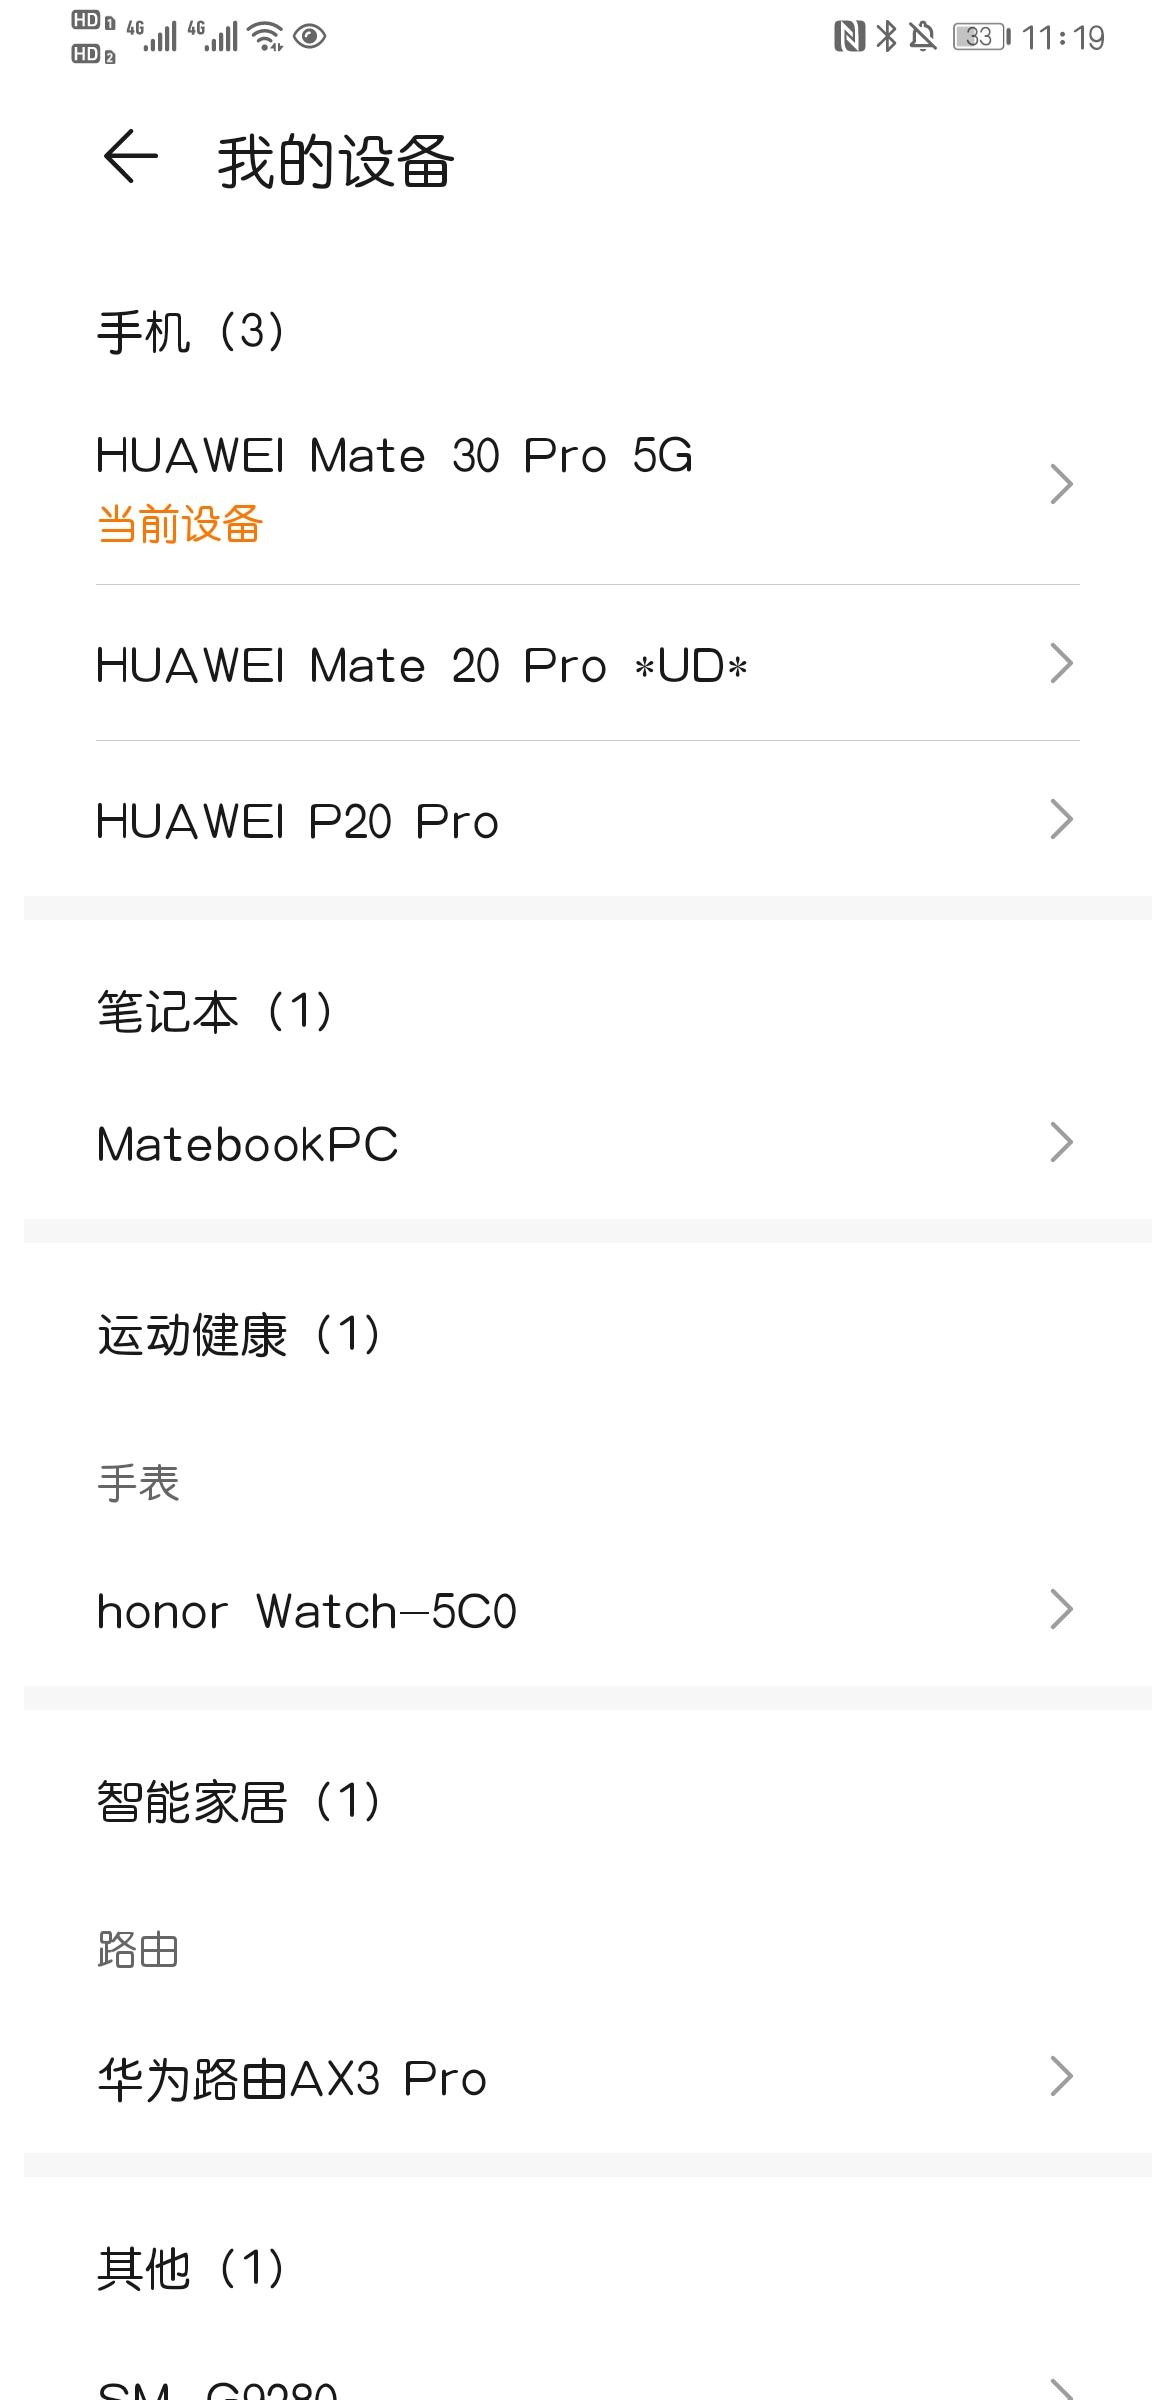 Screenshot_20200516_111945_com.huawei.hwid.jpg